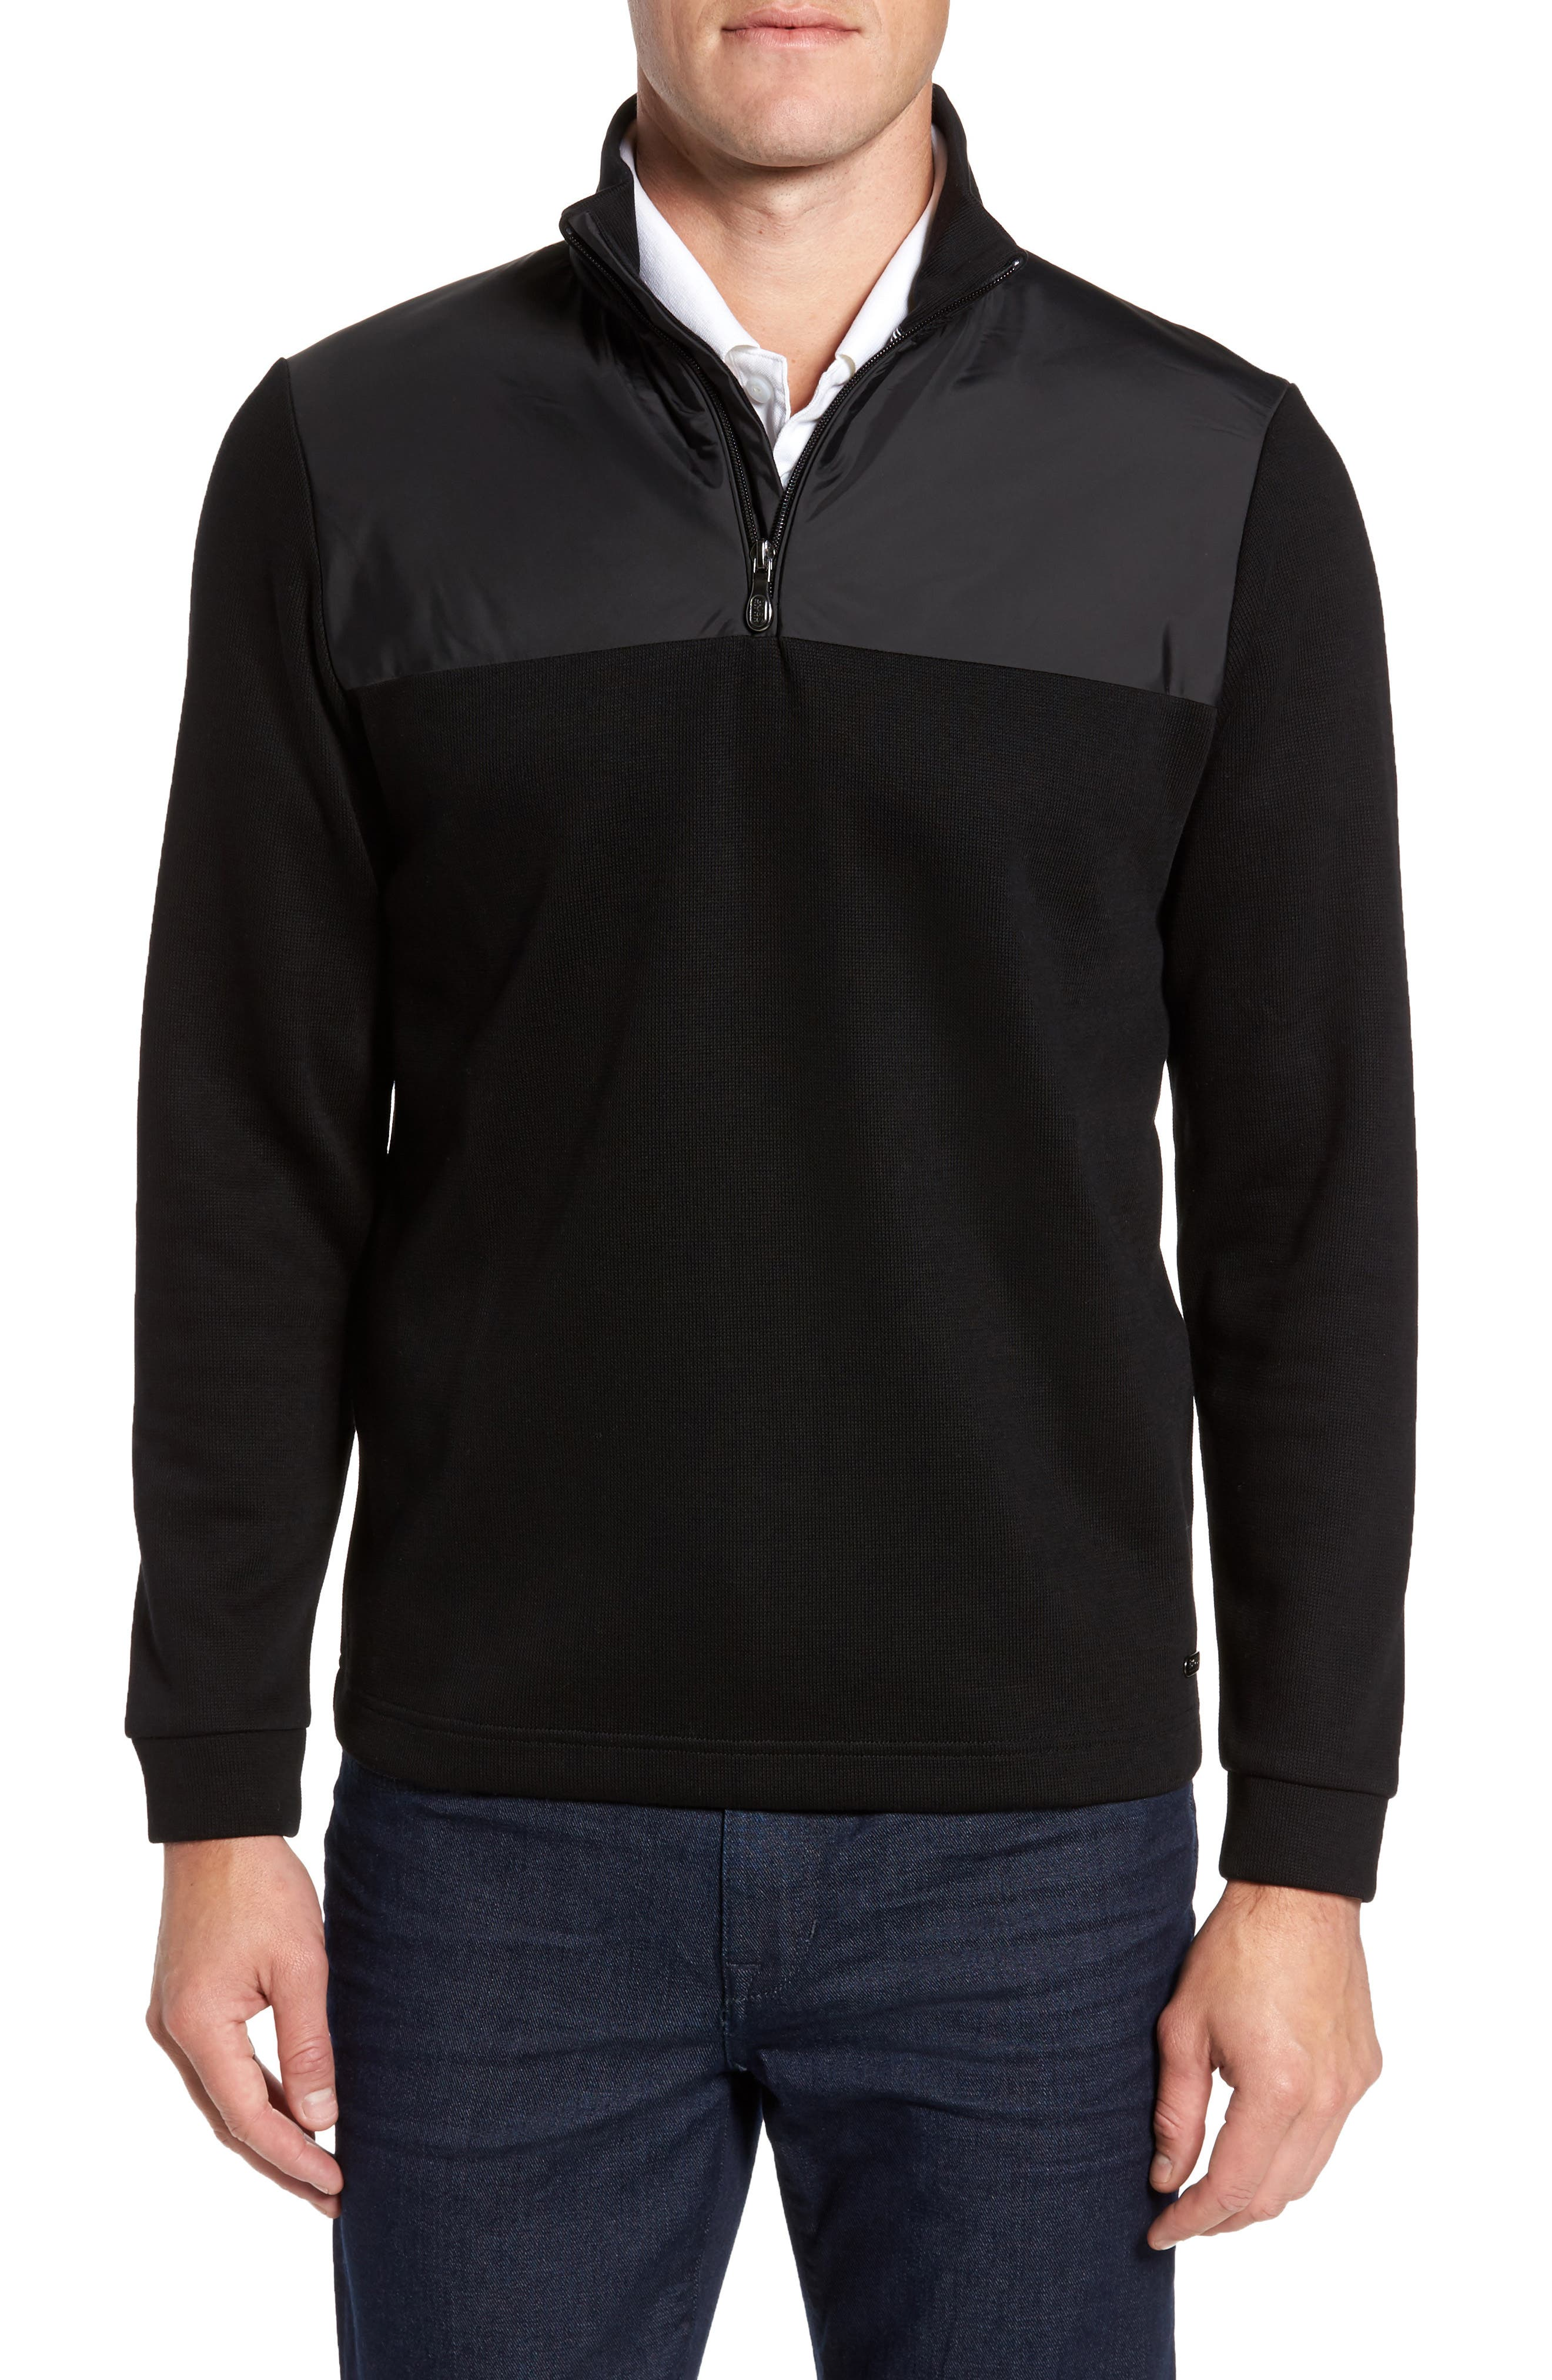 Main Image - BOSS C-Piceno Quarter Zip Fleece Pullover